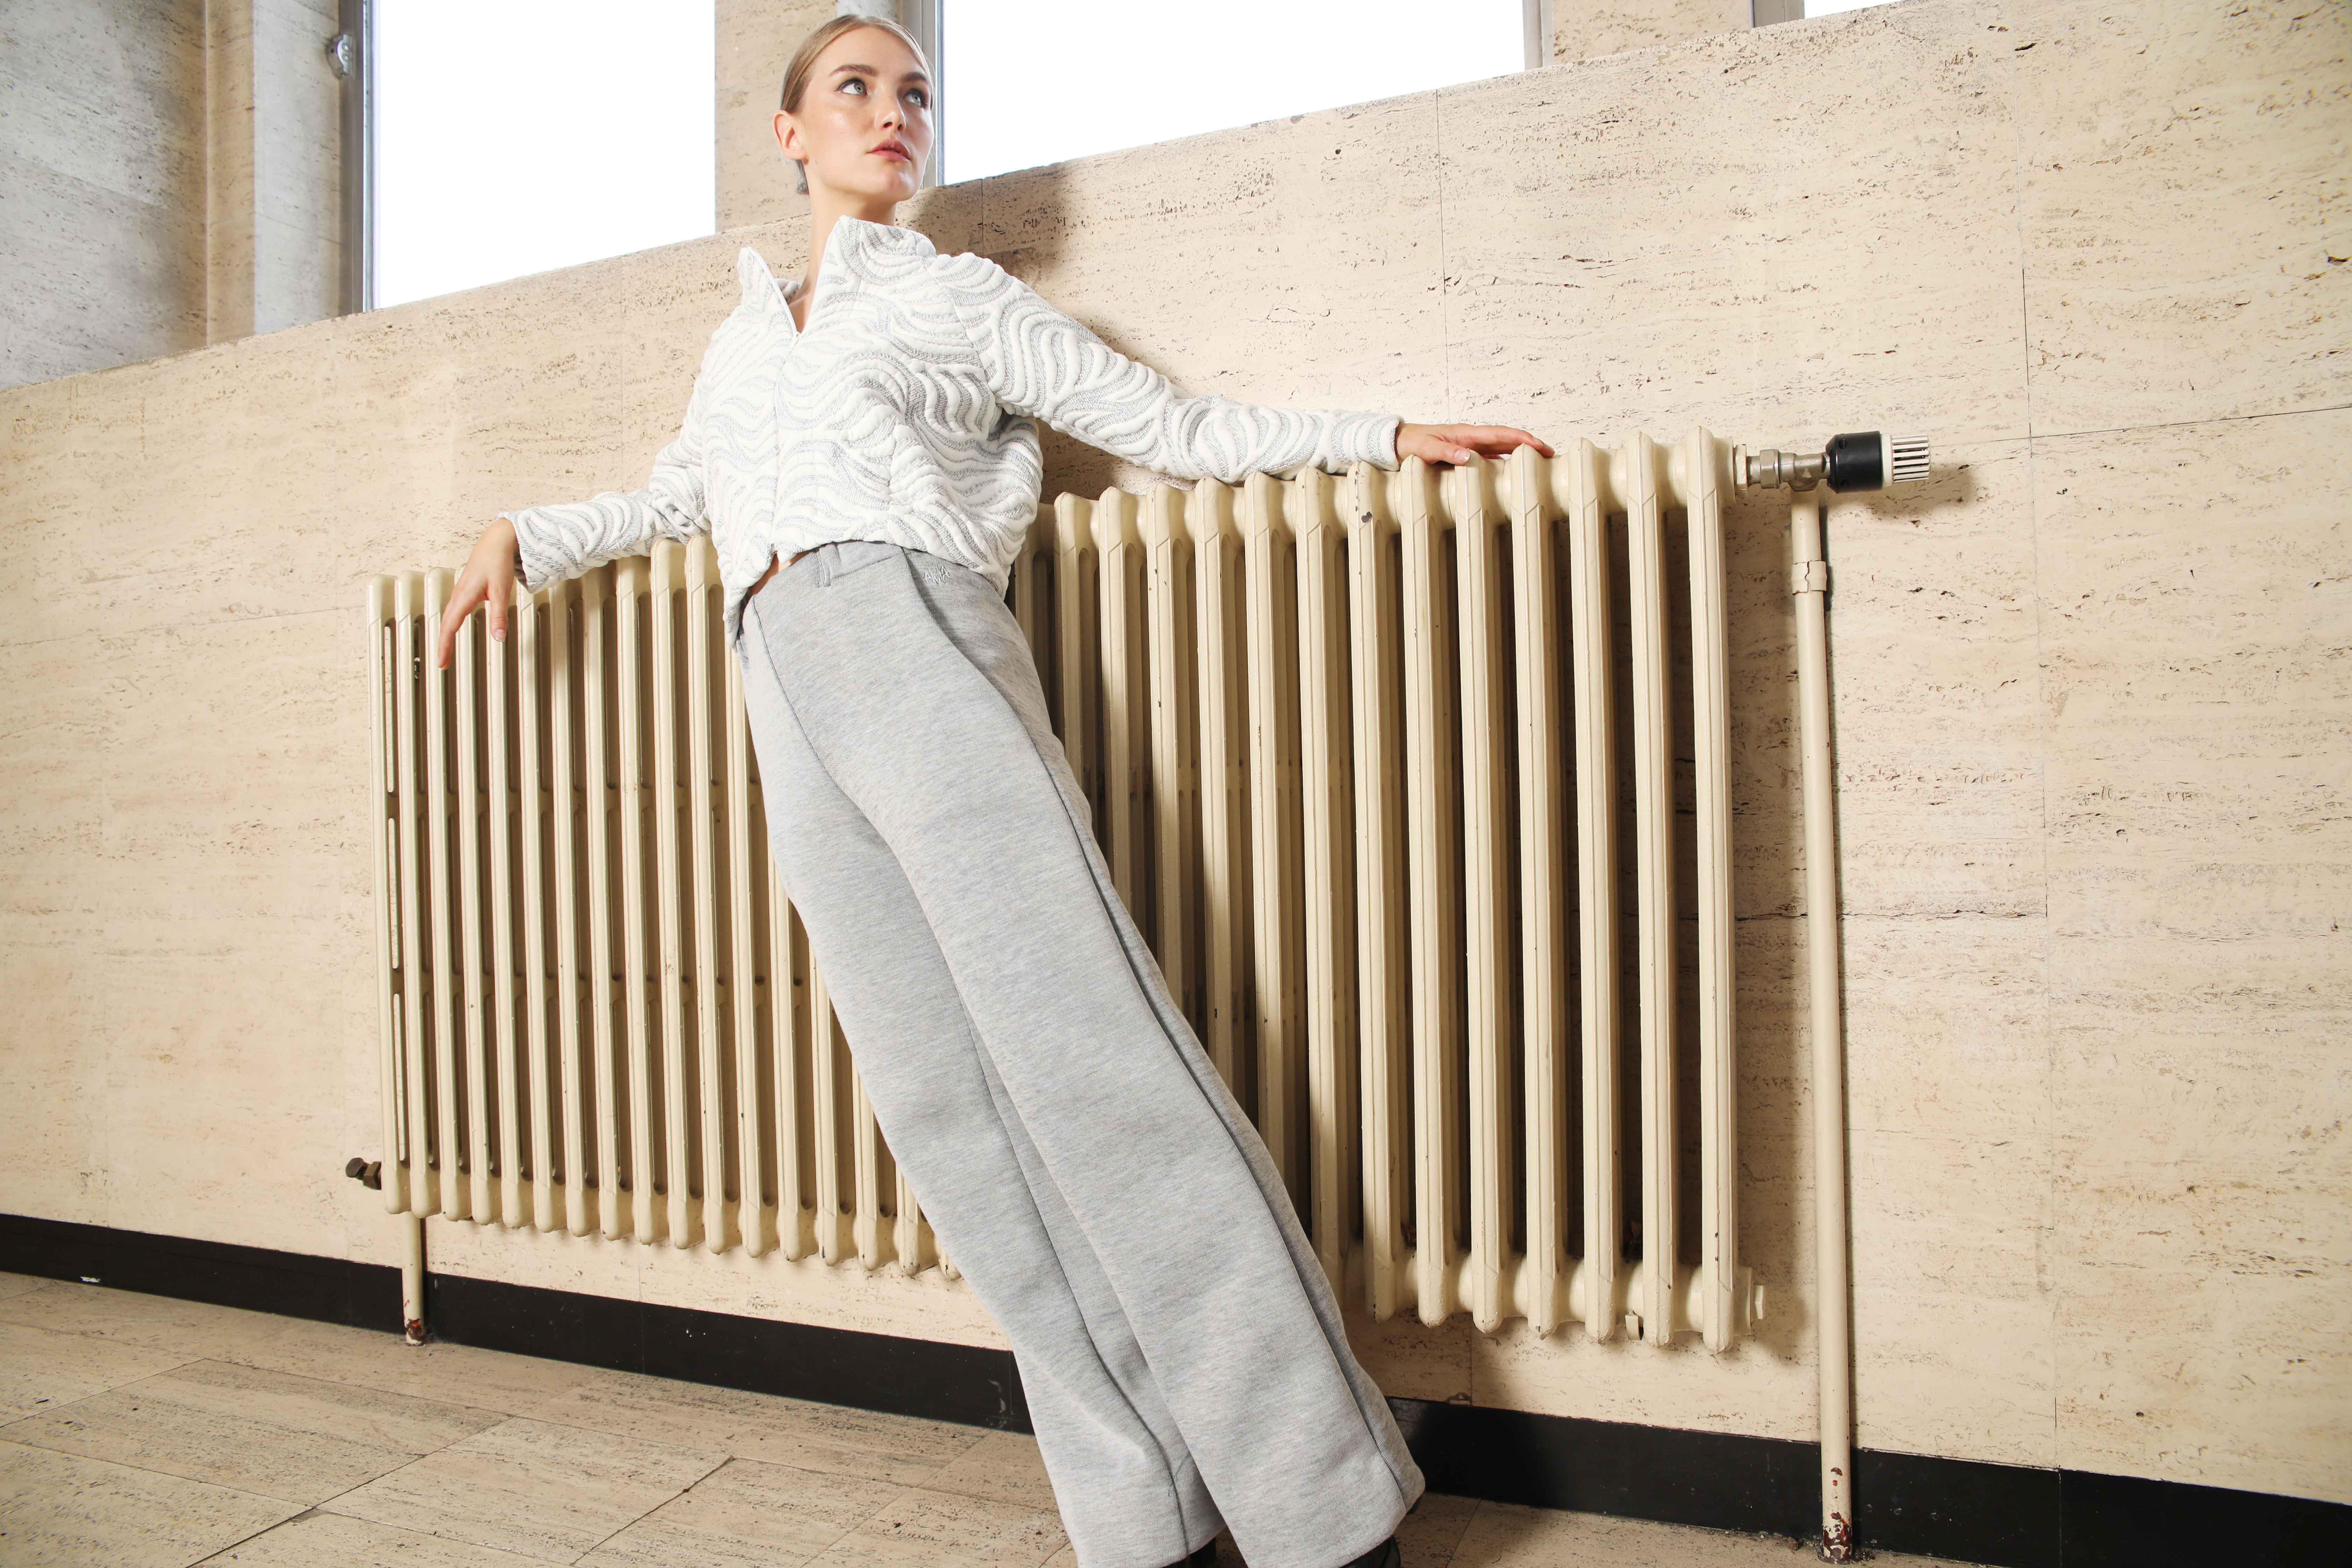 slow fashion, outfit, kledij, korte keten, sustainable, ecologisch, winter, white, grey, trousers, jacket, unisex, women